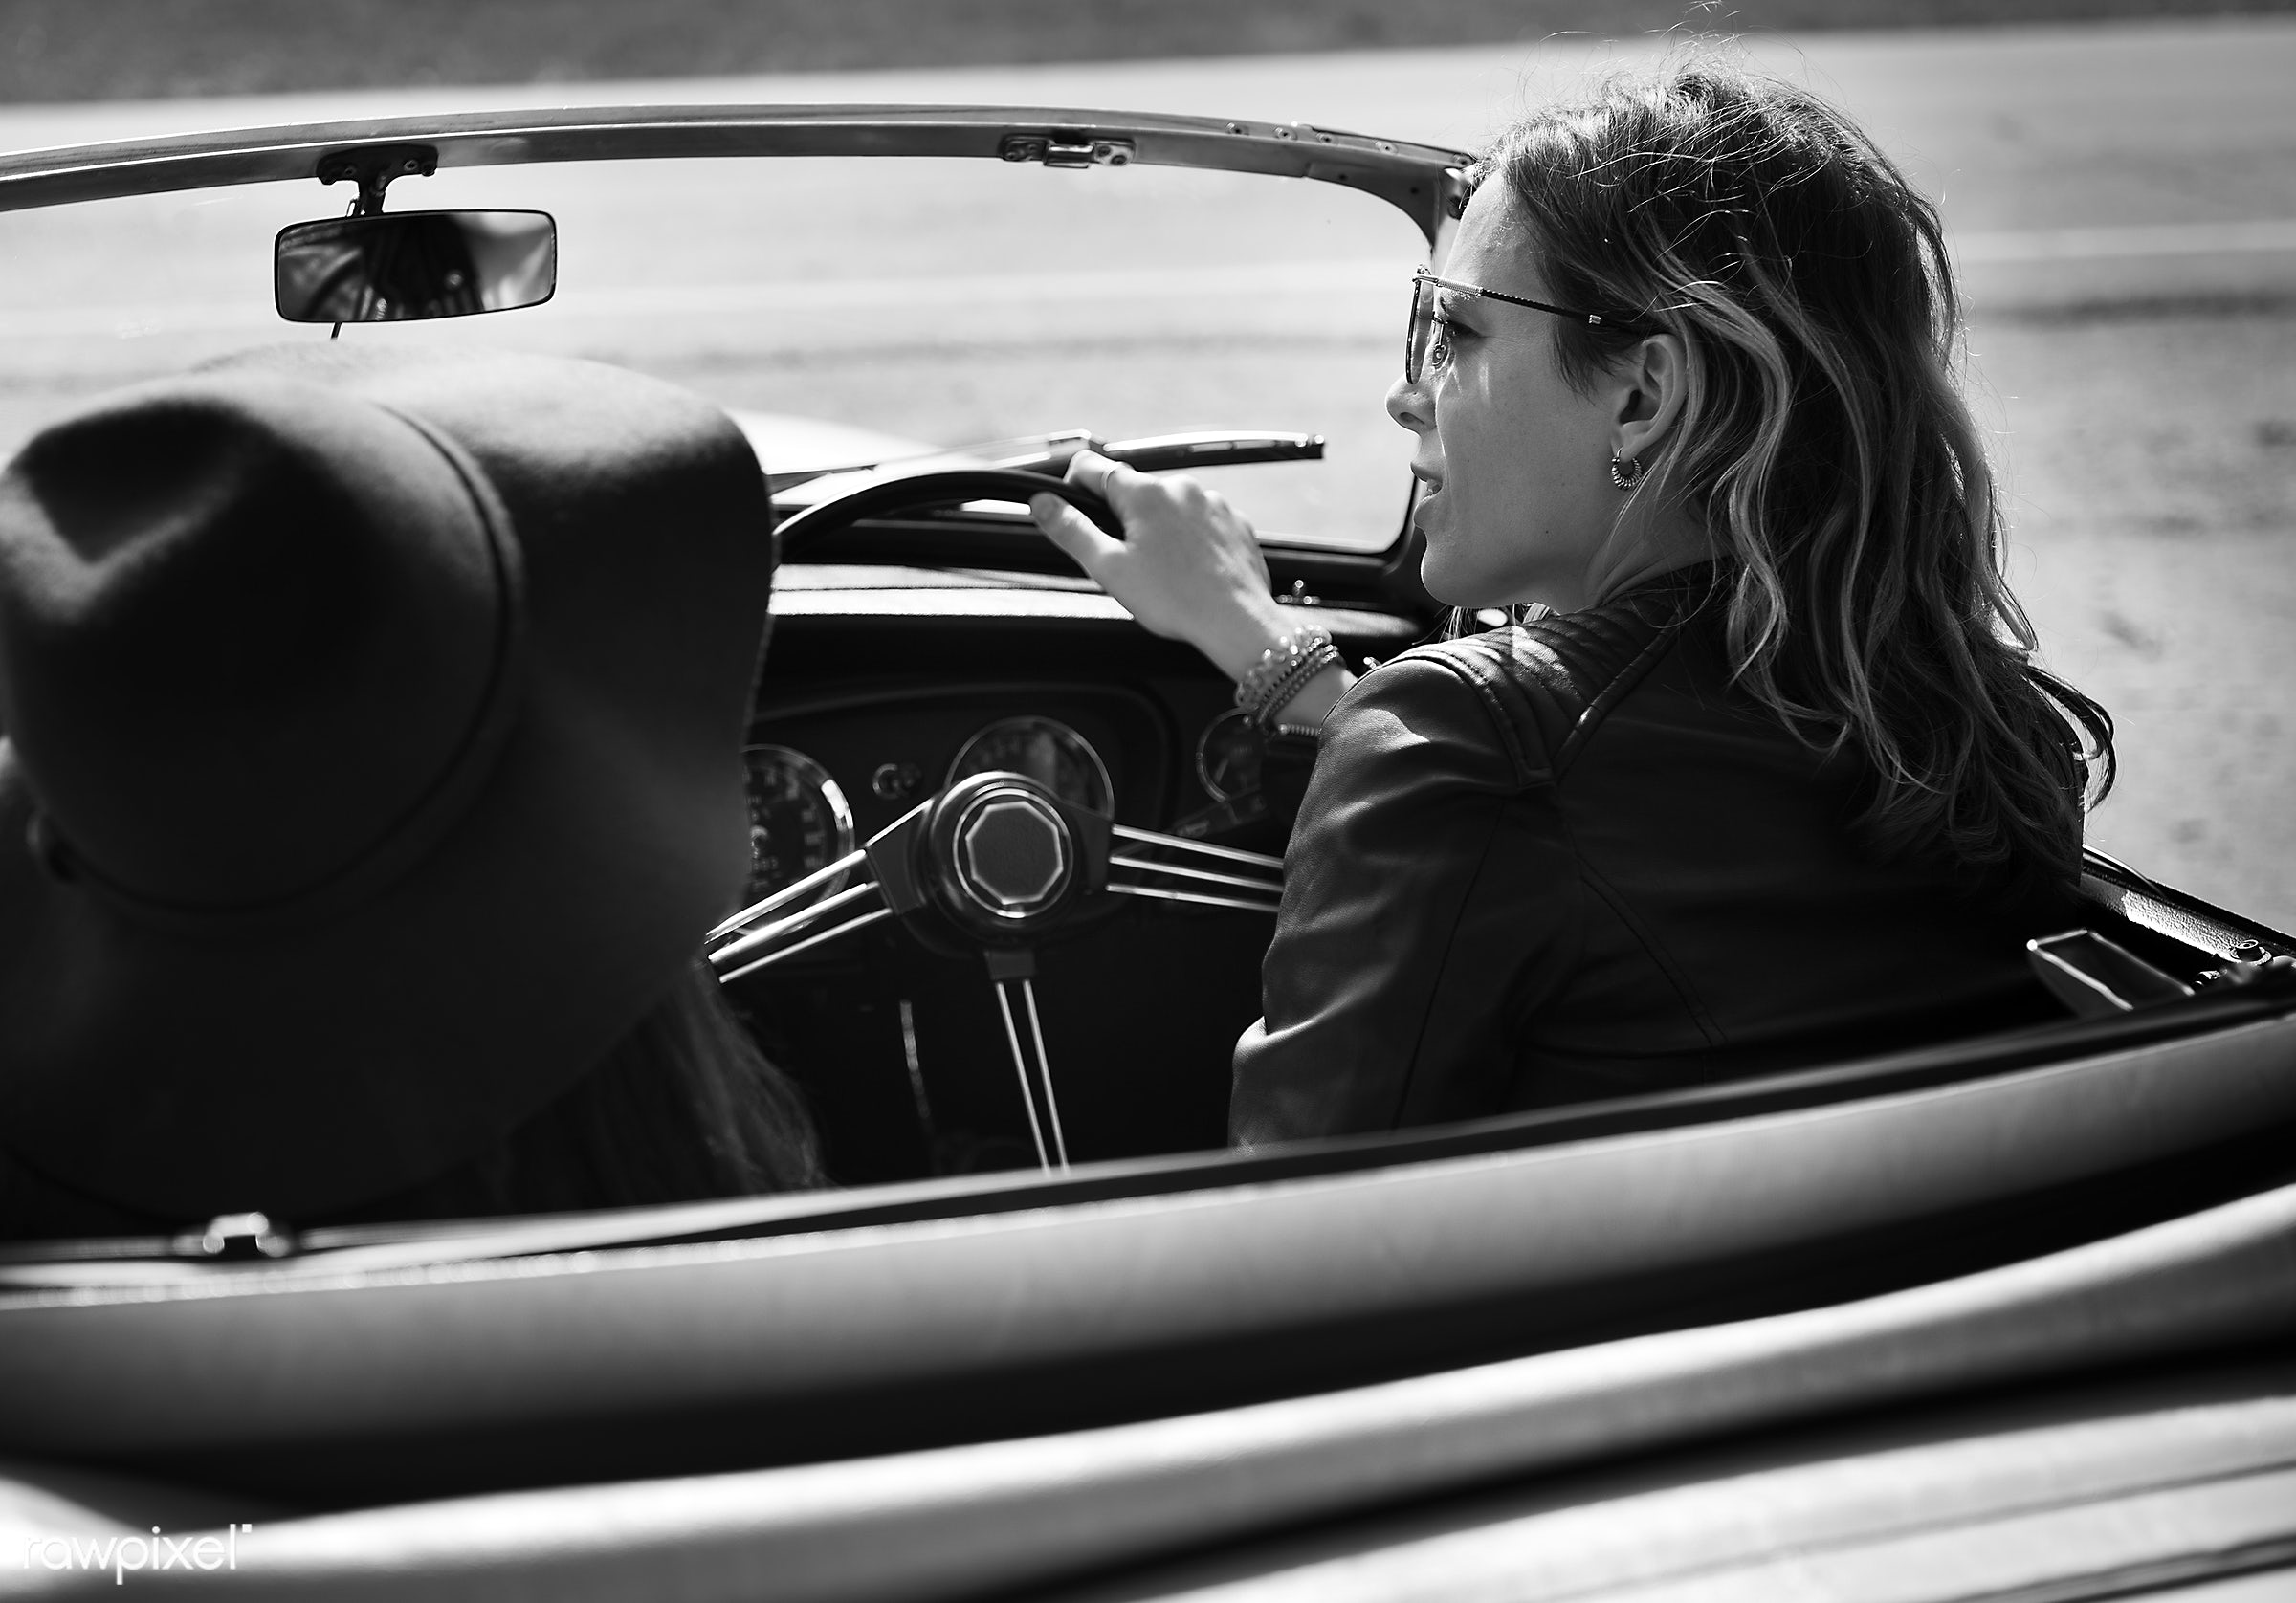 adult, adventure, attractive, beauty, car, couple, drive, driving, female, happiness, happy, journey, joyful, leisure,...